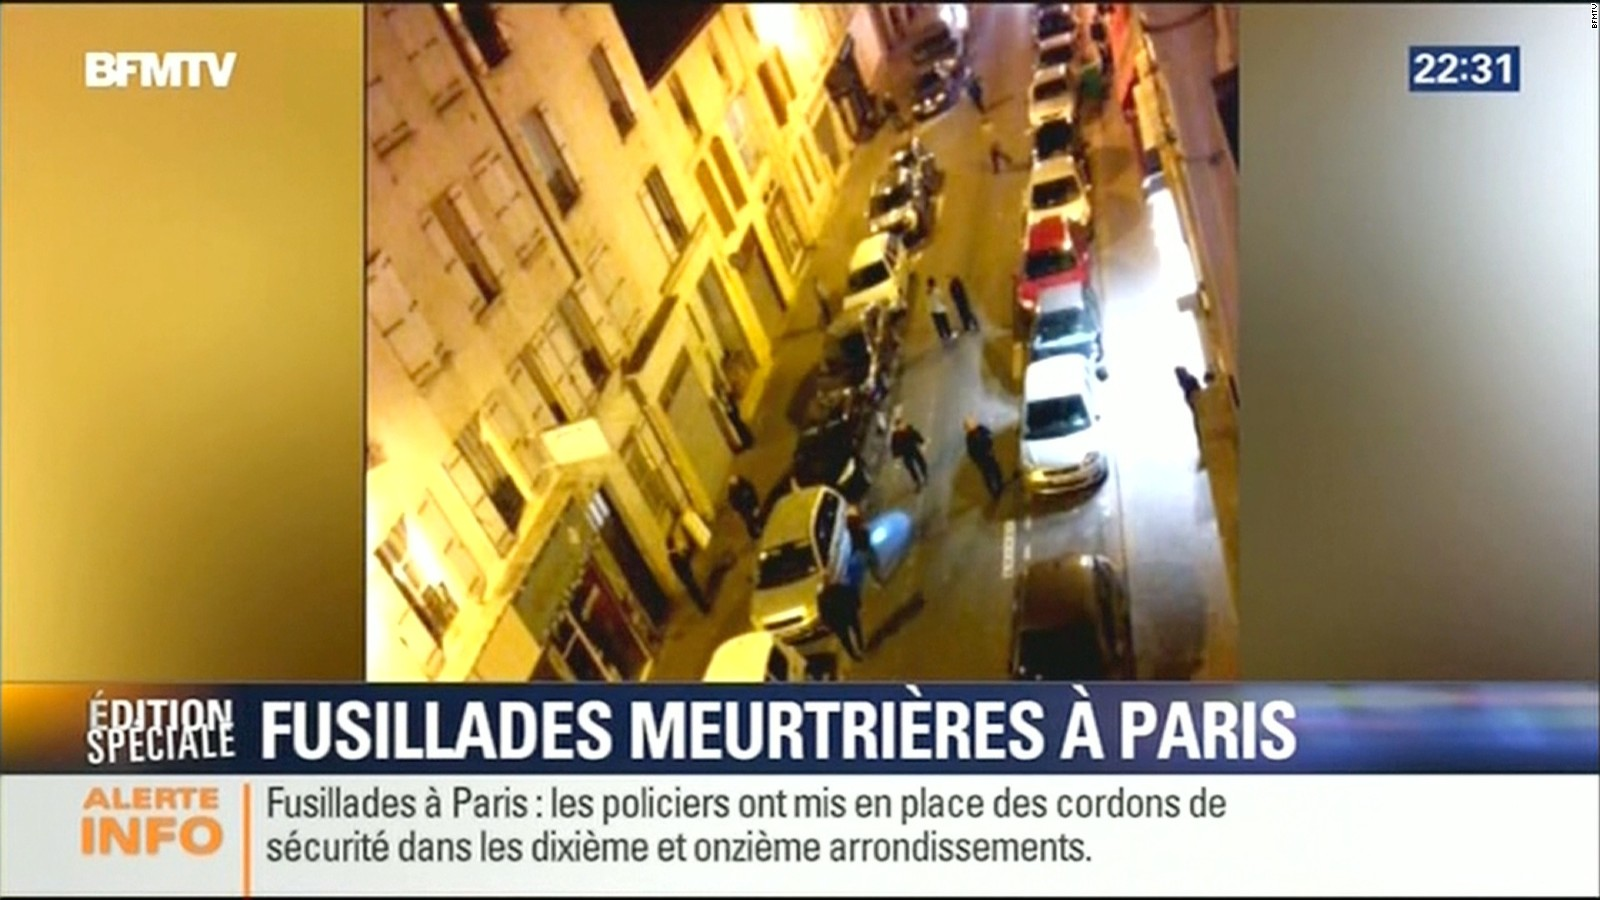 Several killed in shooting outside Paris restaurant